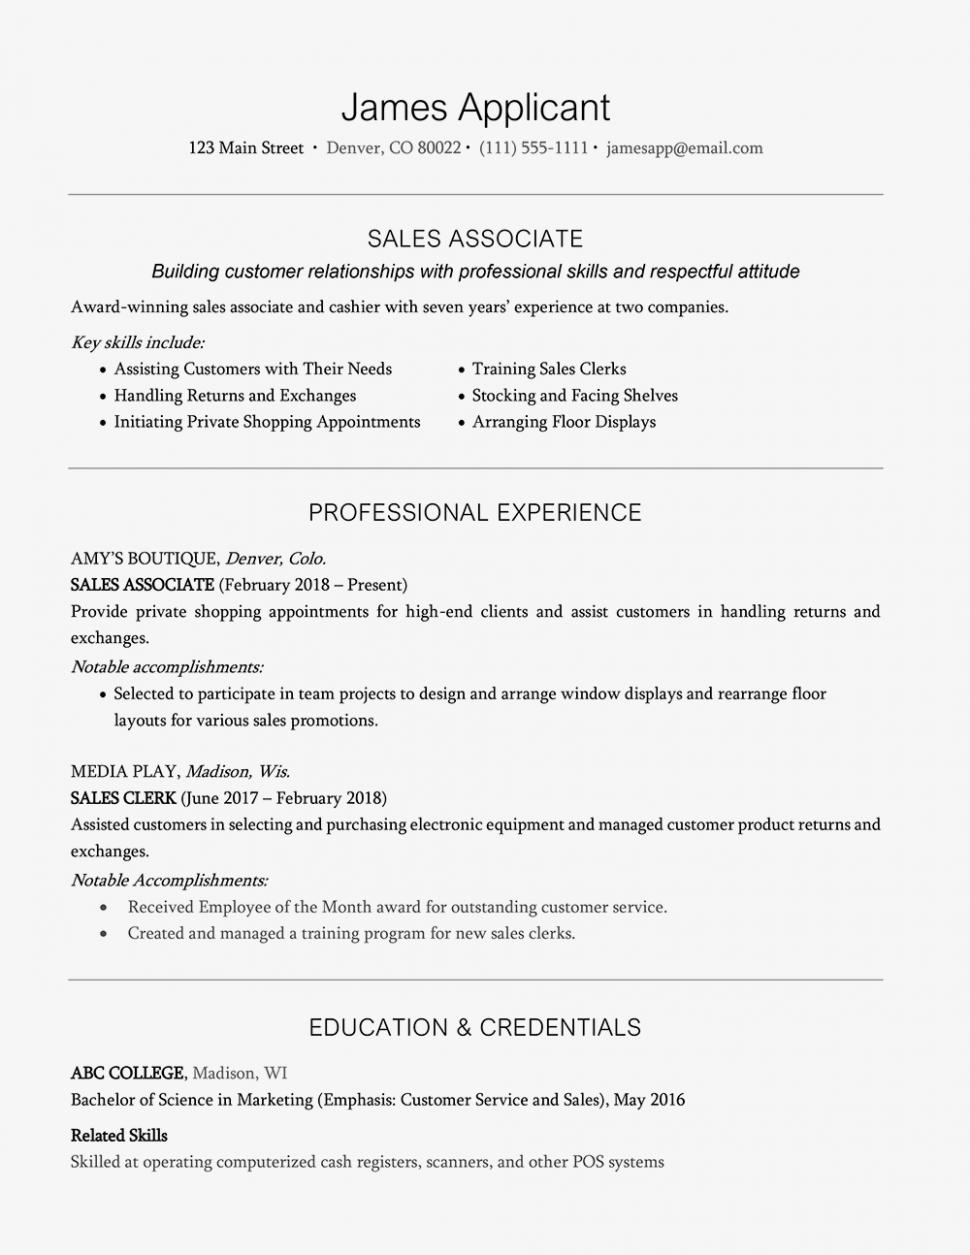 10 Resume Headline For Network Engineer 10 Resume Headline